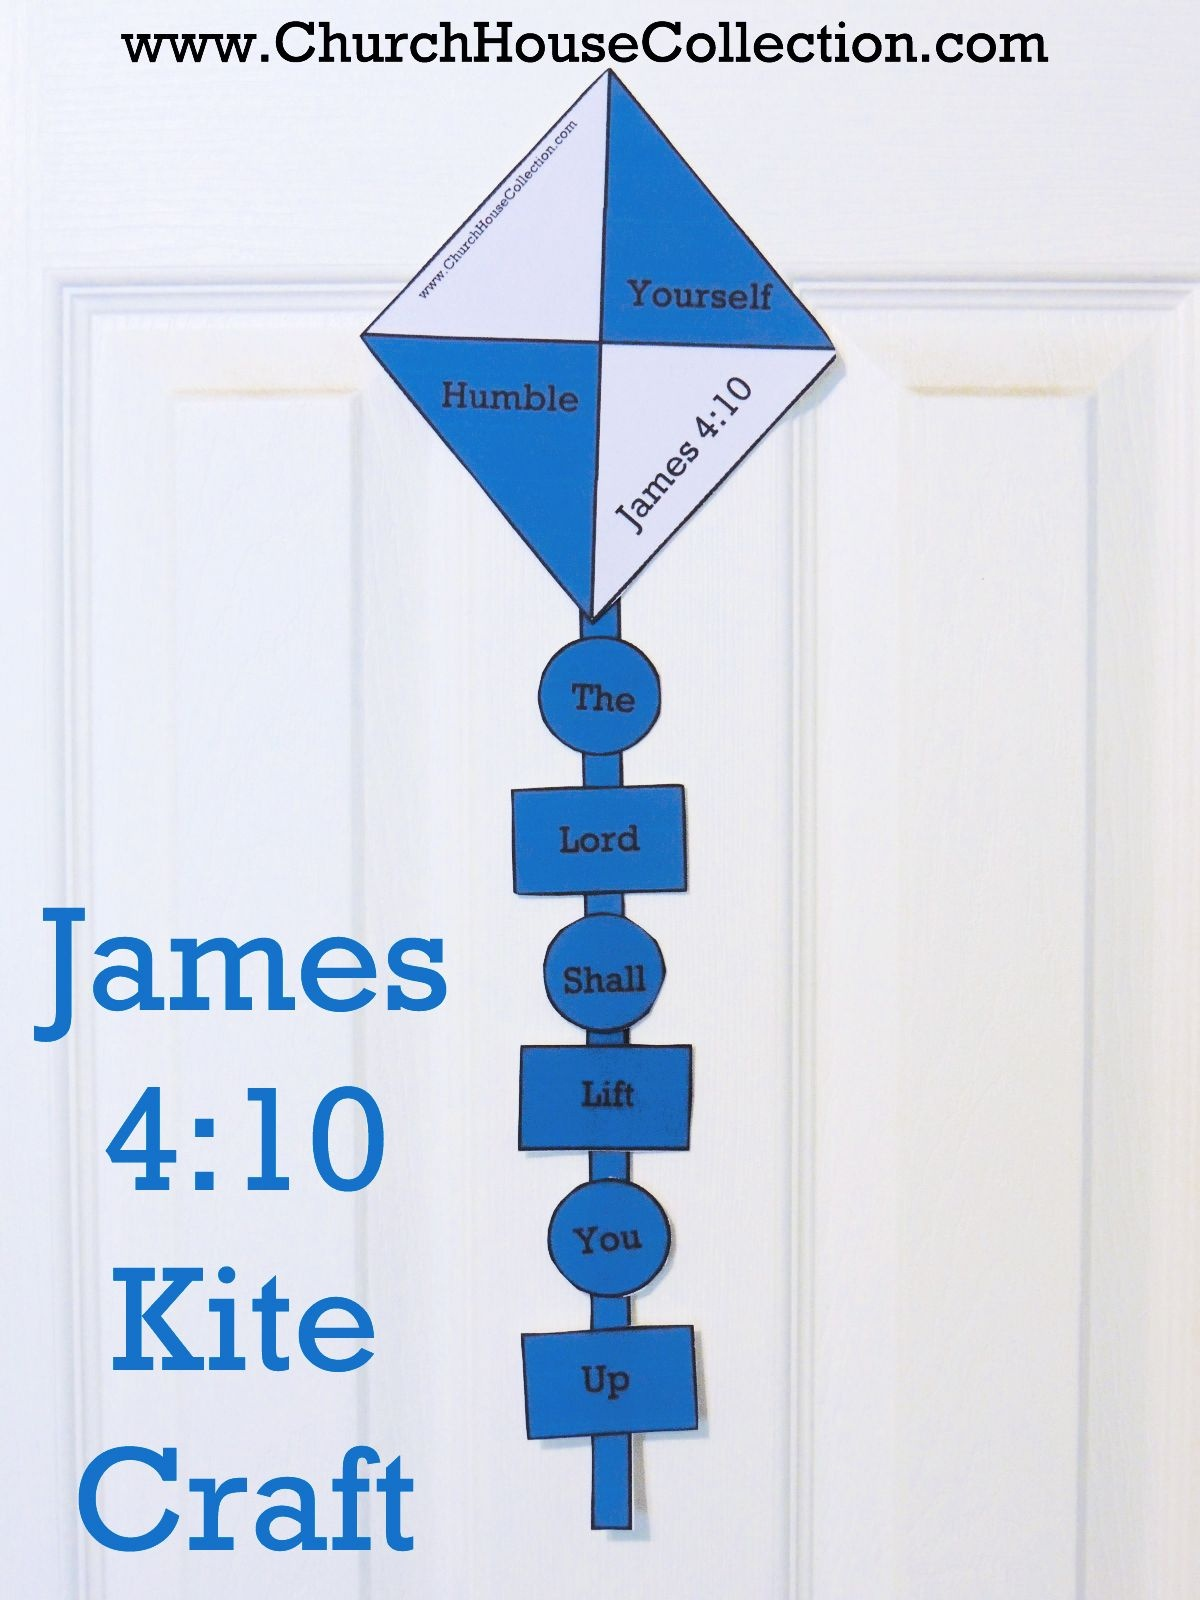 Kite Cutout Craft For Sunday School Kids James 4:10- Free Printable - Free Printable Sunday School Crafts